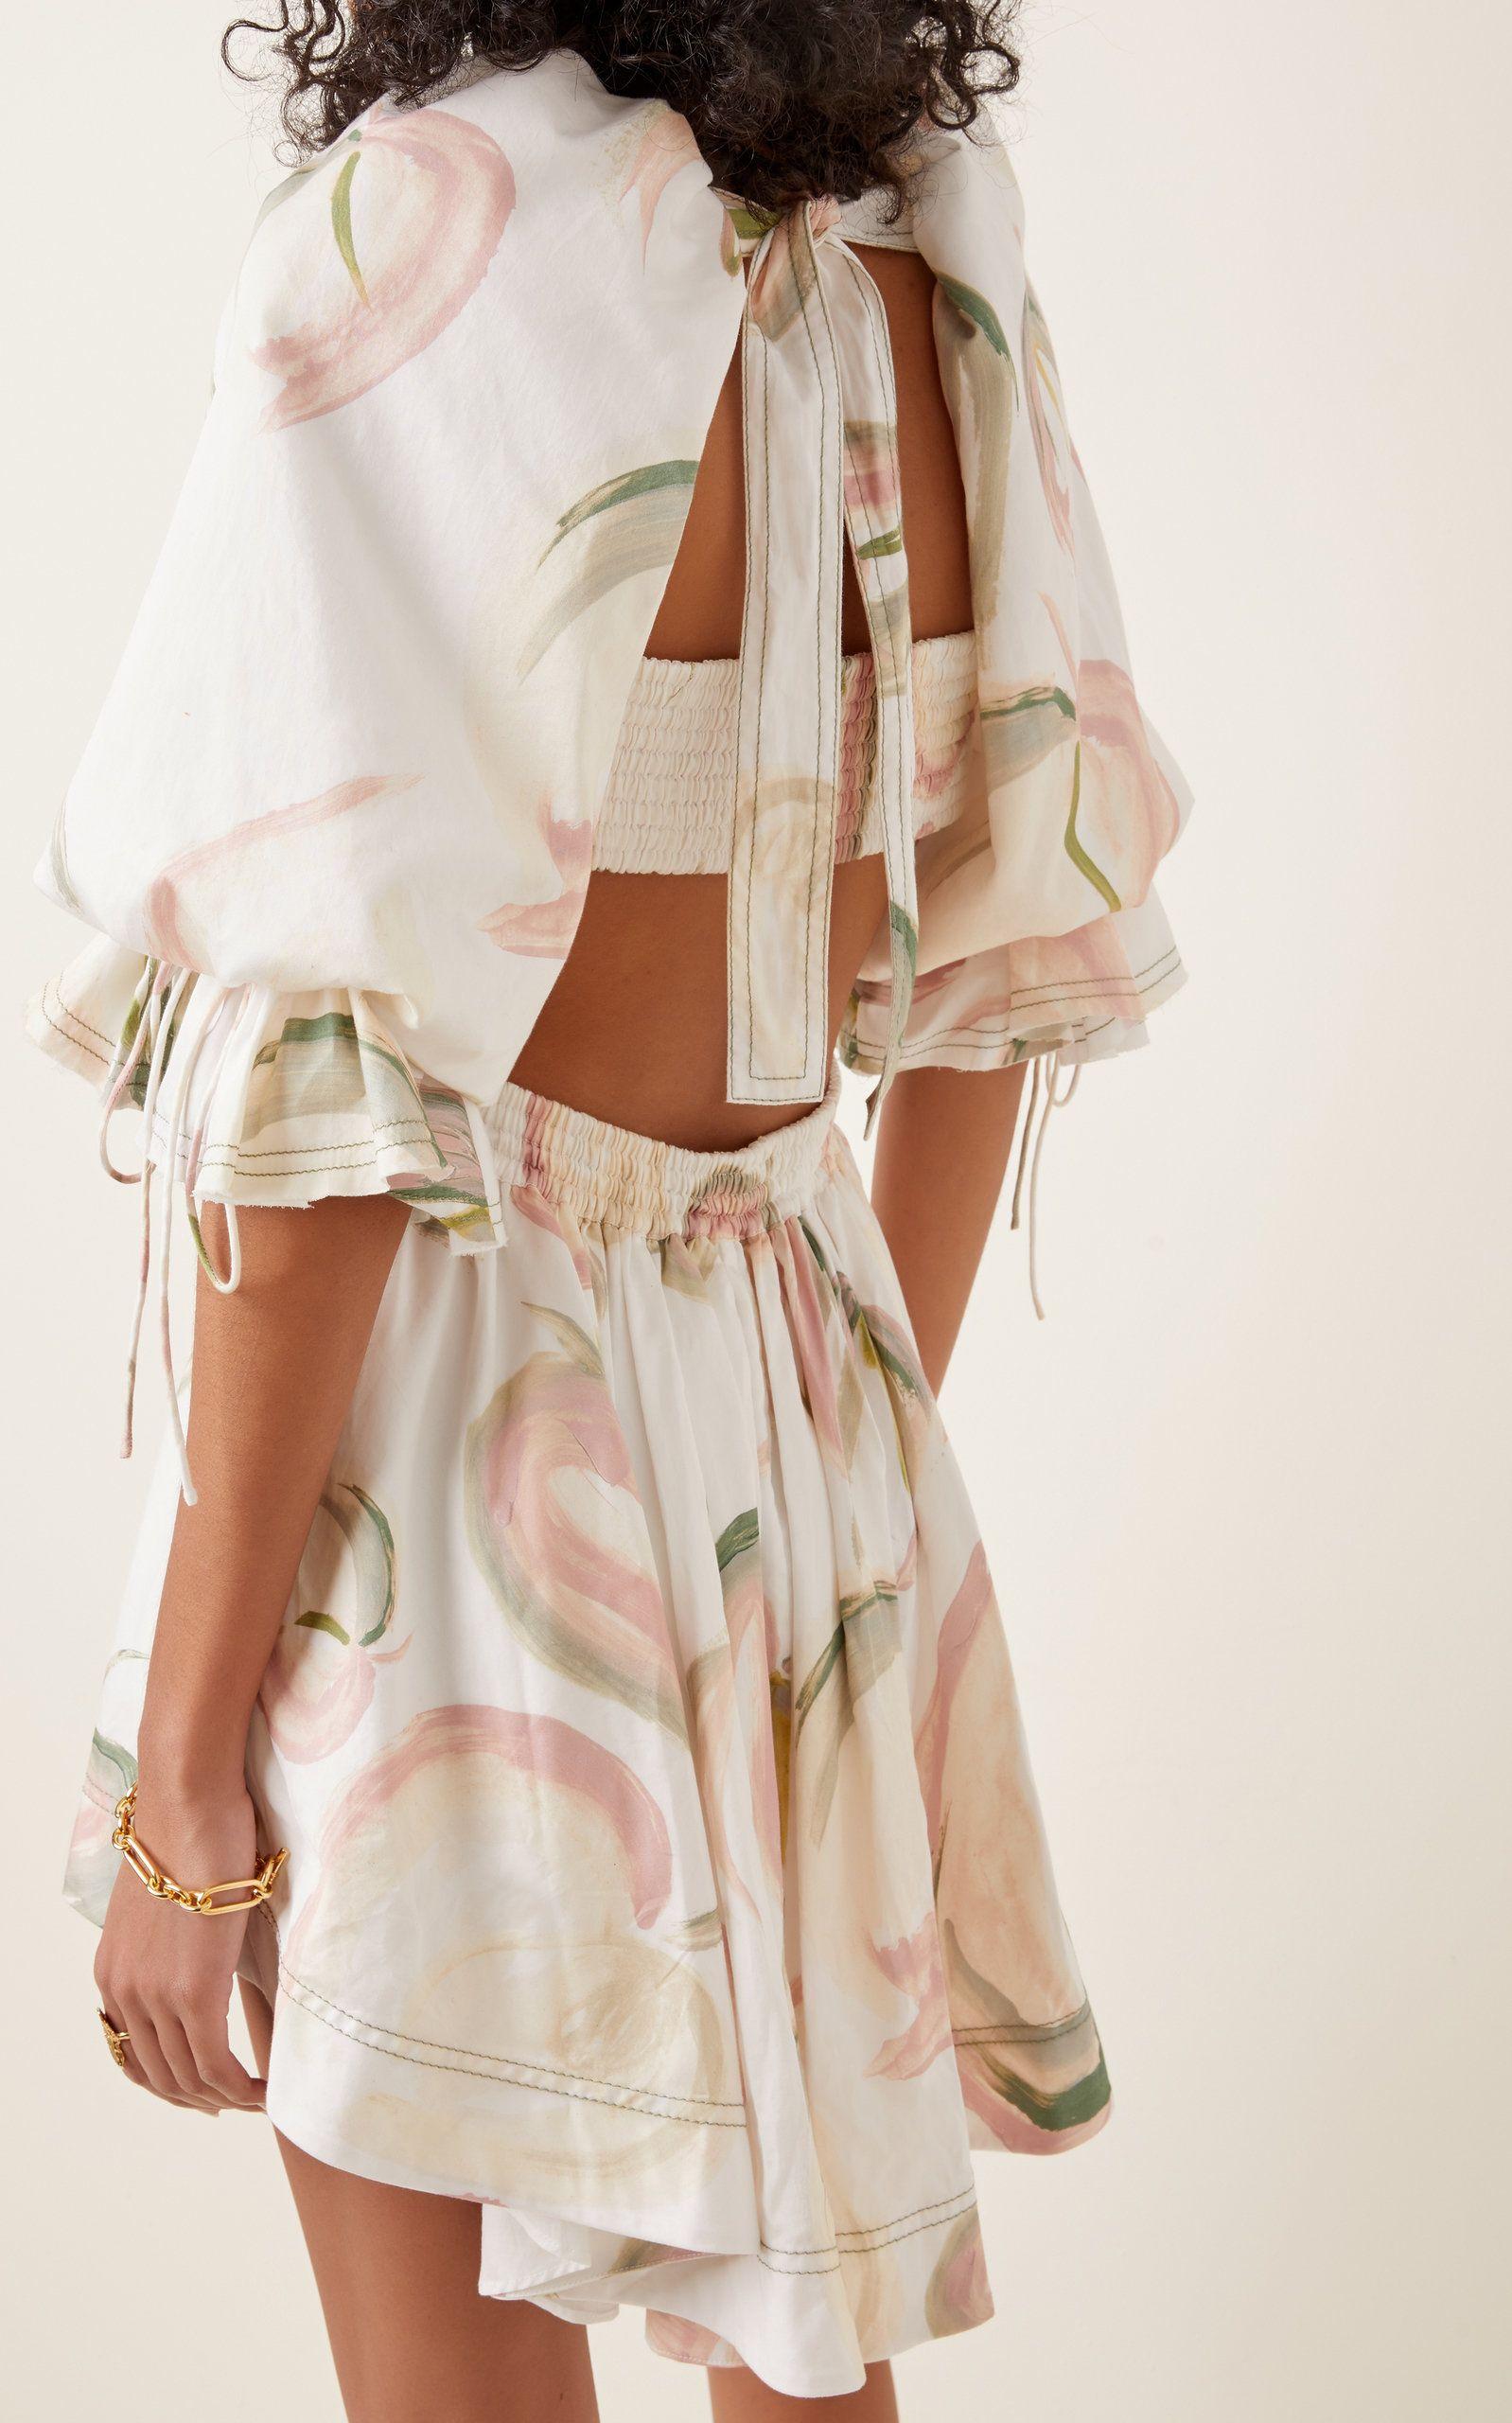 Aje - Imprint Mini Dress | All The Dresses